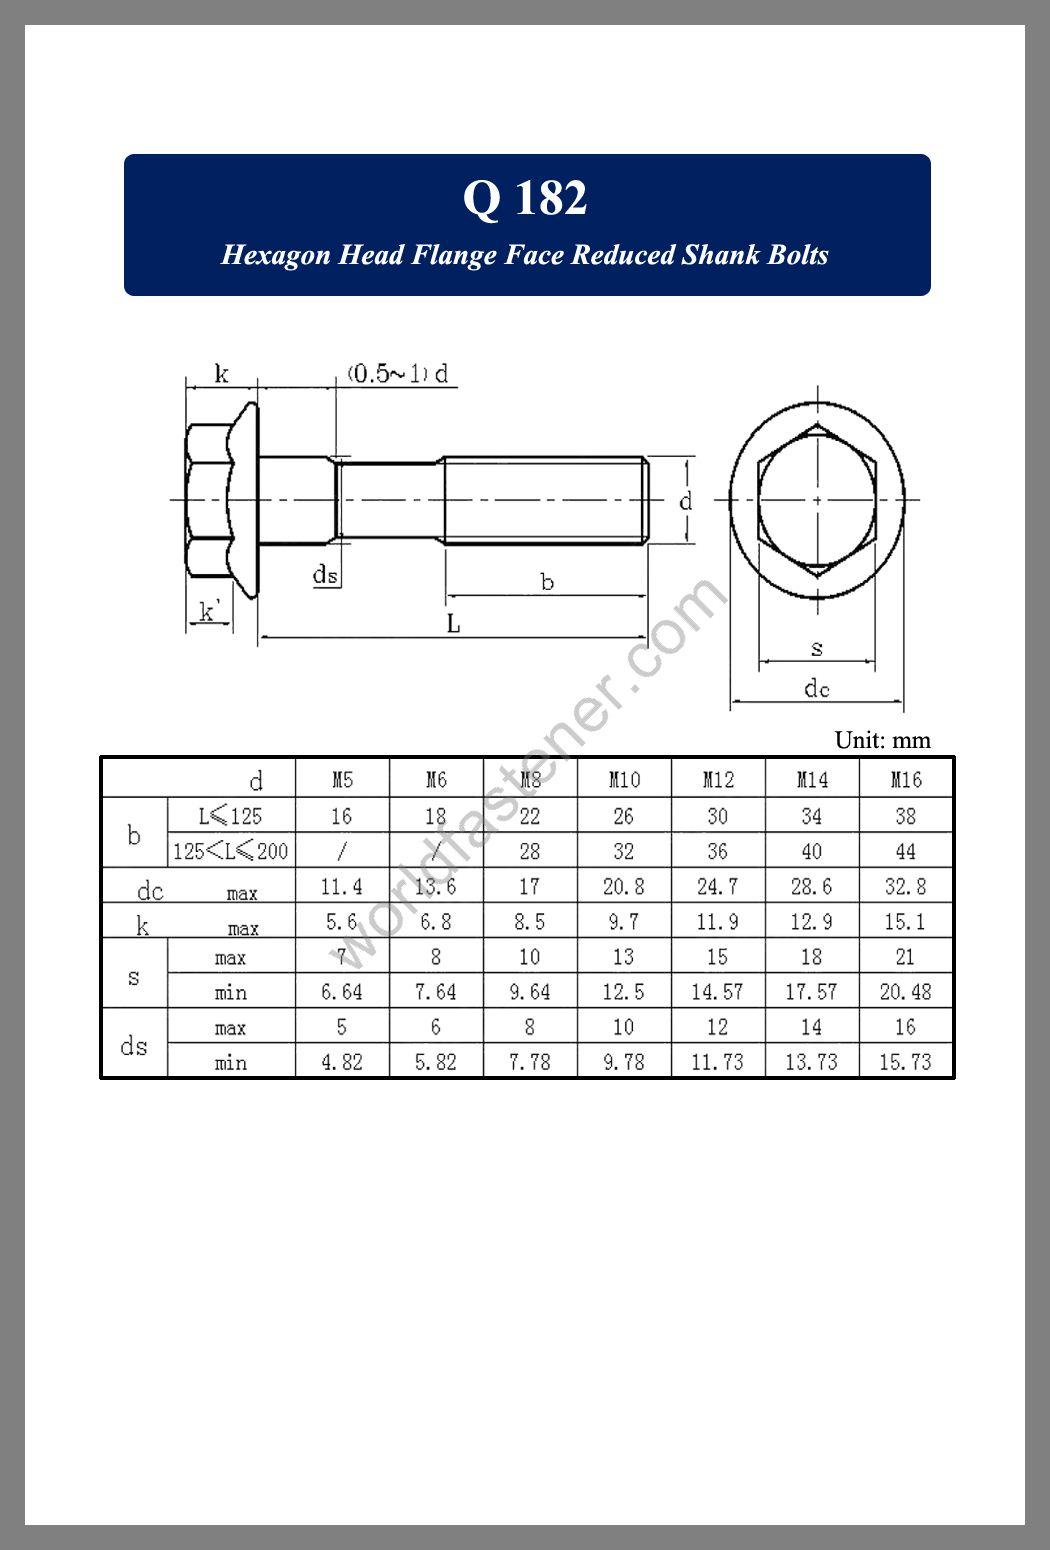 Q 182, Q 182 Flanged Bolts, Flange screws, fastener, screw, bolt, Q bolts